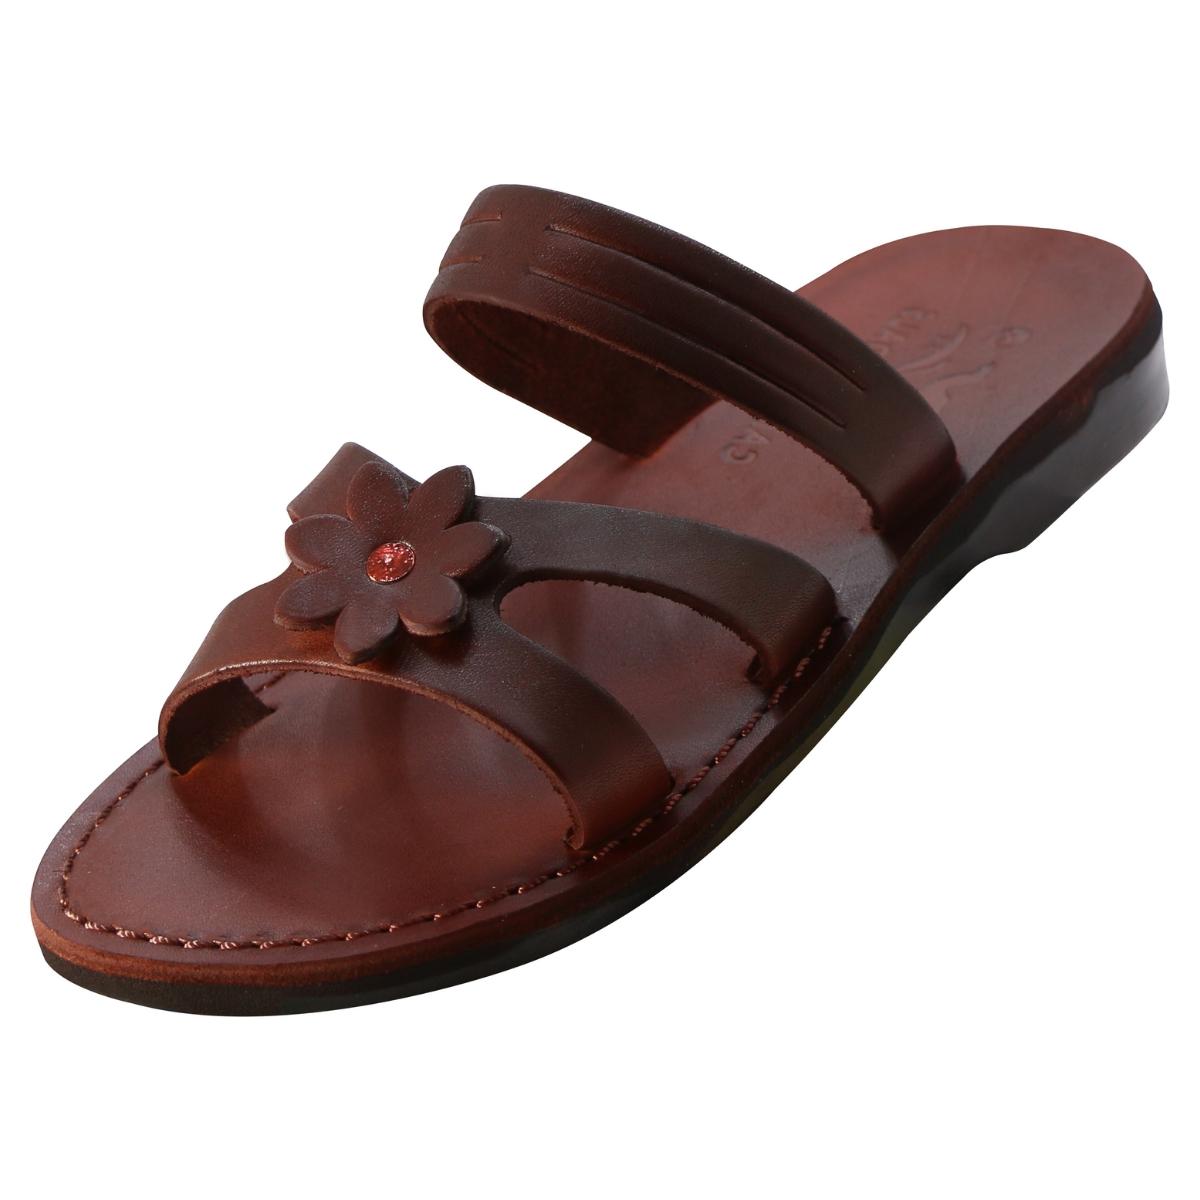 de15ada9c01cf3 Buy Slip on Handmade Leather Sandals with Flower - Oranit